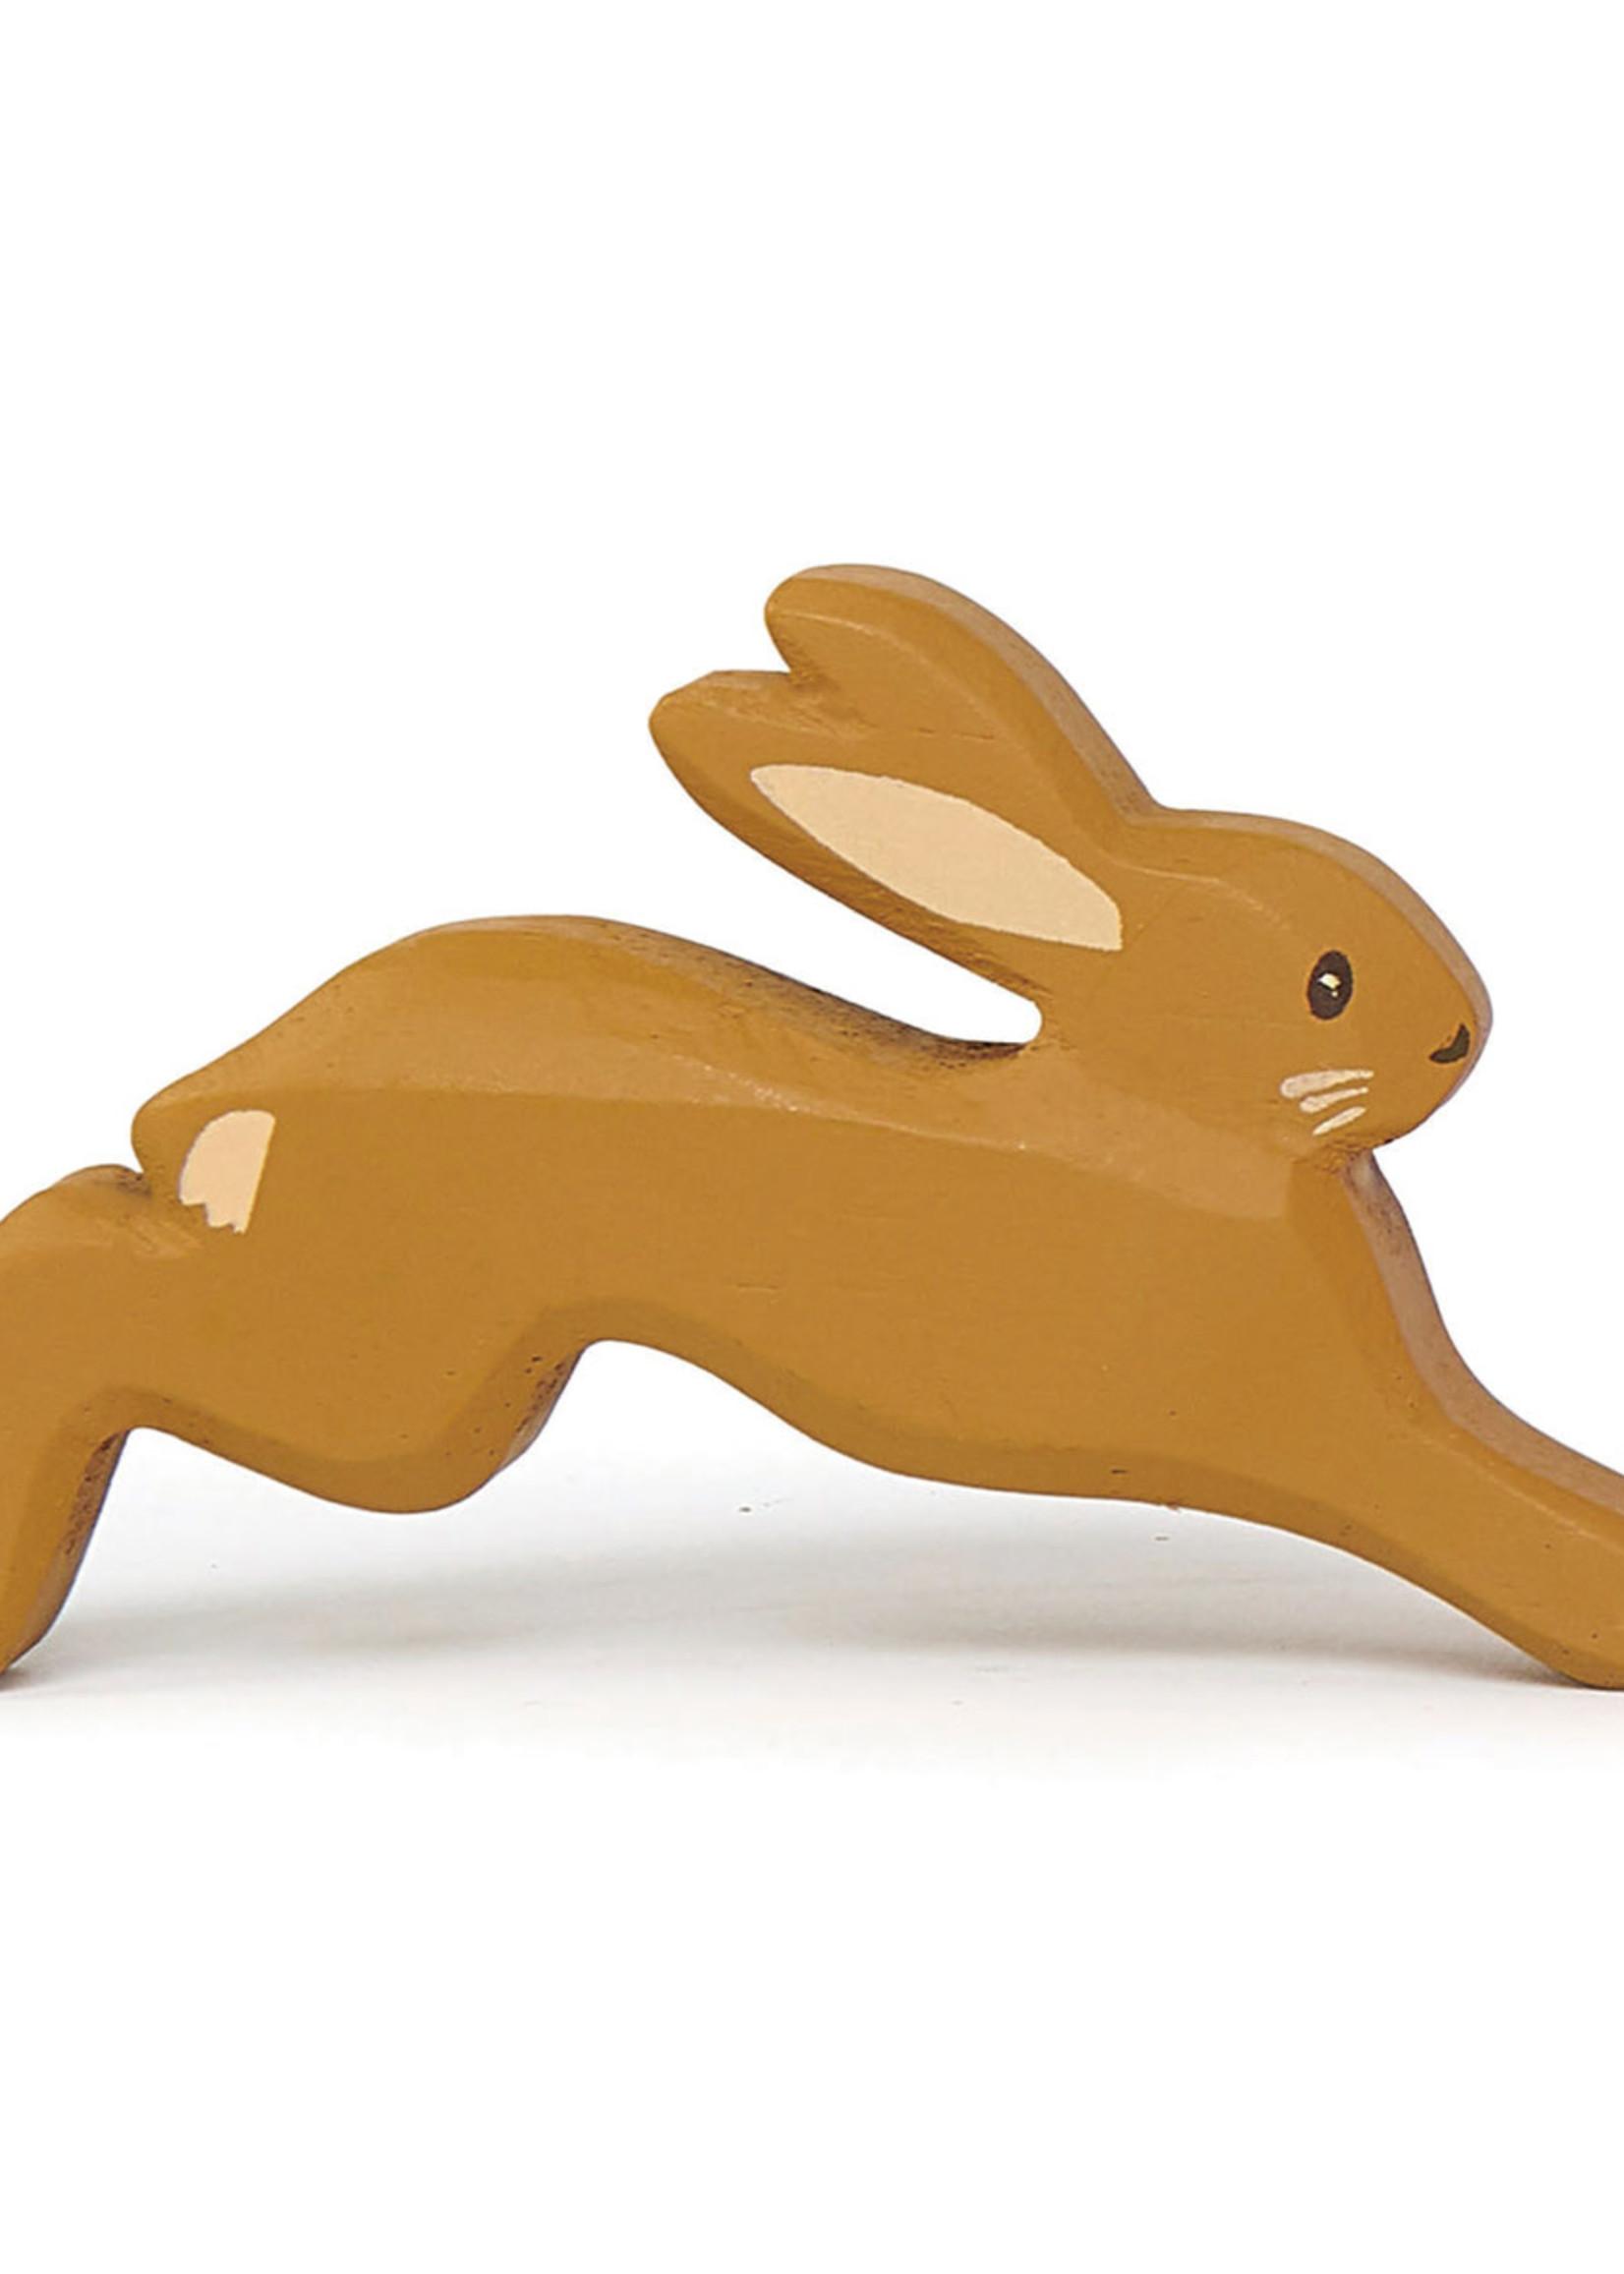 Tender Leaf Toys Woodland Animal Hare